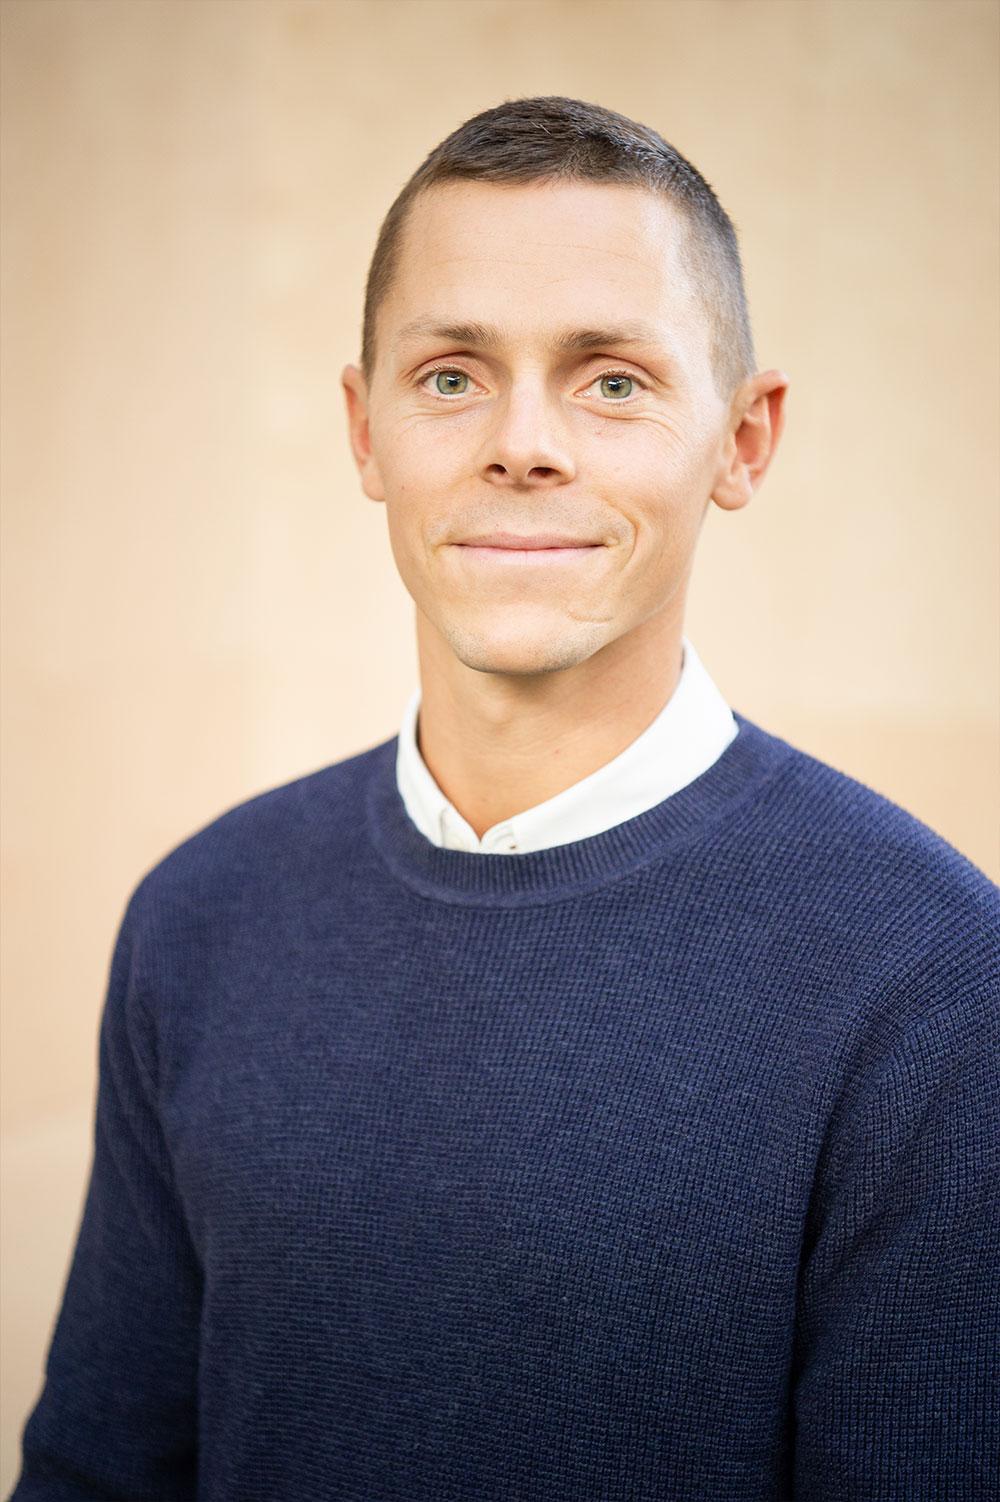 Fredrik-Örneblad-Chalmers-VenturesFredrik-Örneblad-Chalmers-Ventures